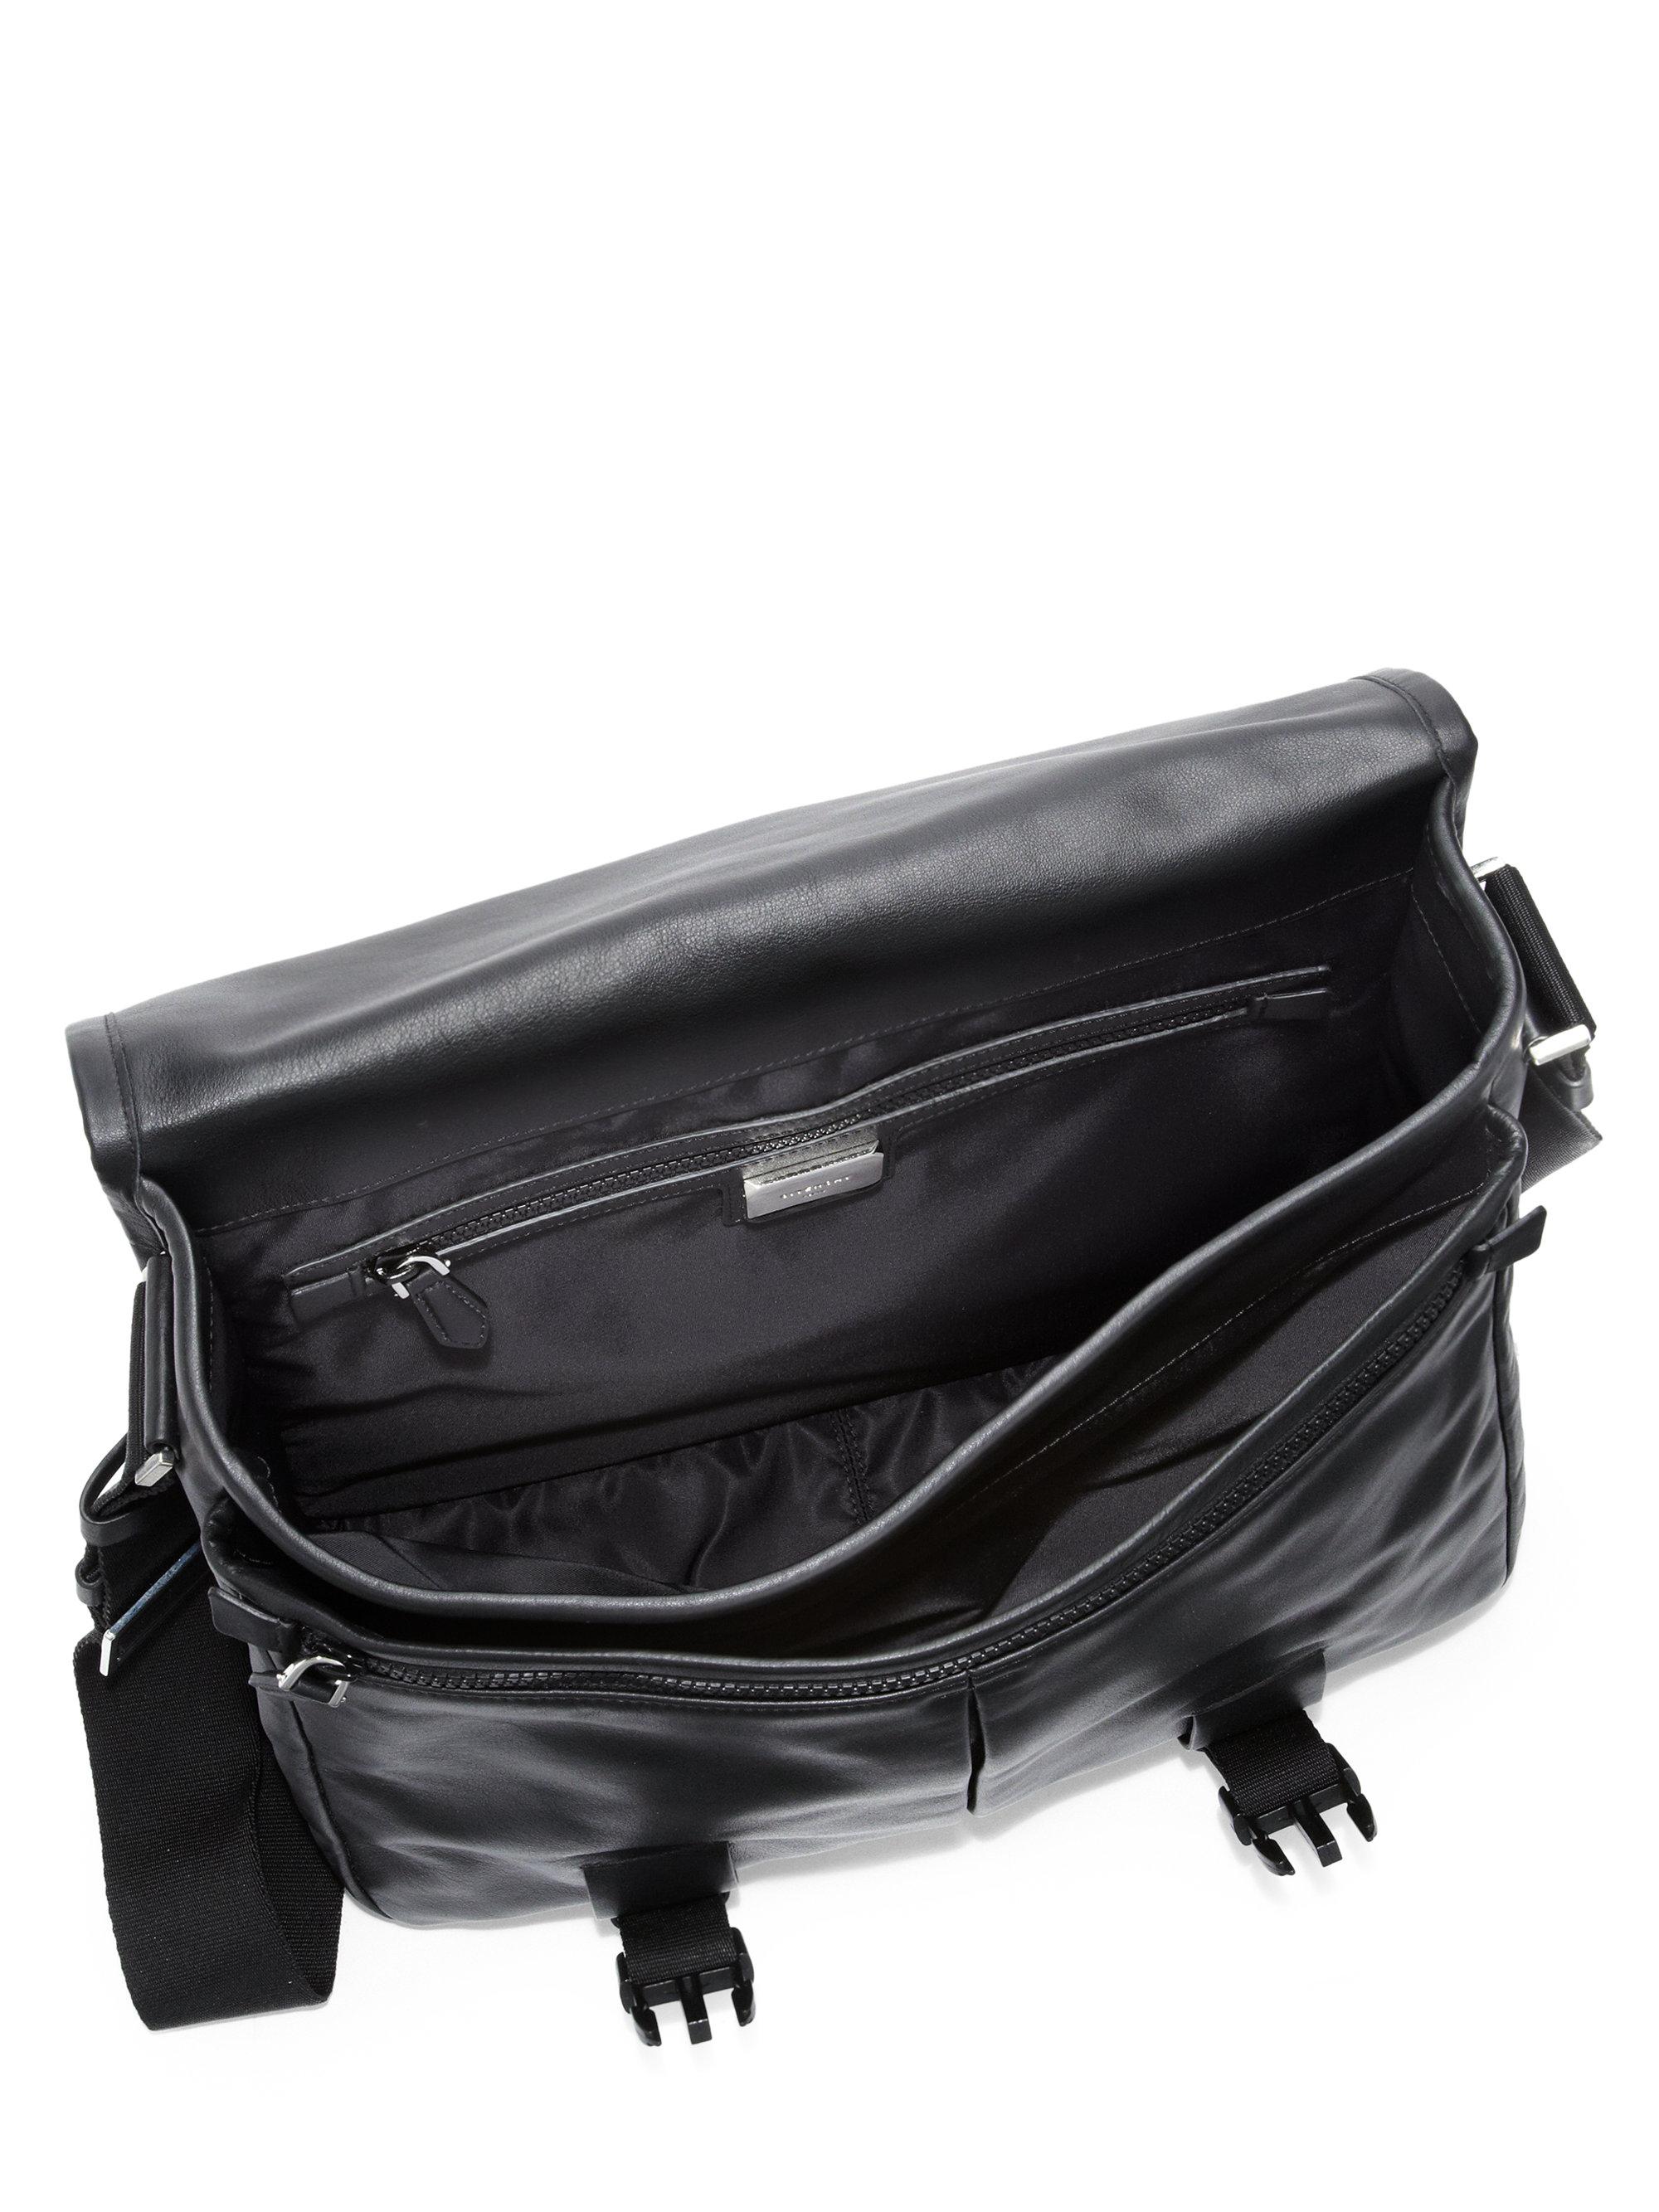 Lyst - Givenchy Obsedia Leather Messenger Bag in Black for Men 06757068c2e50